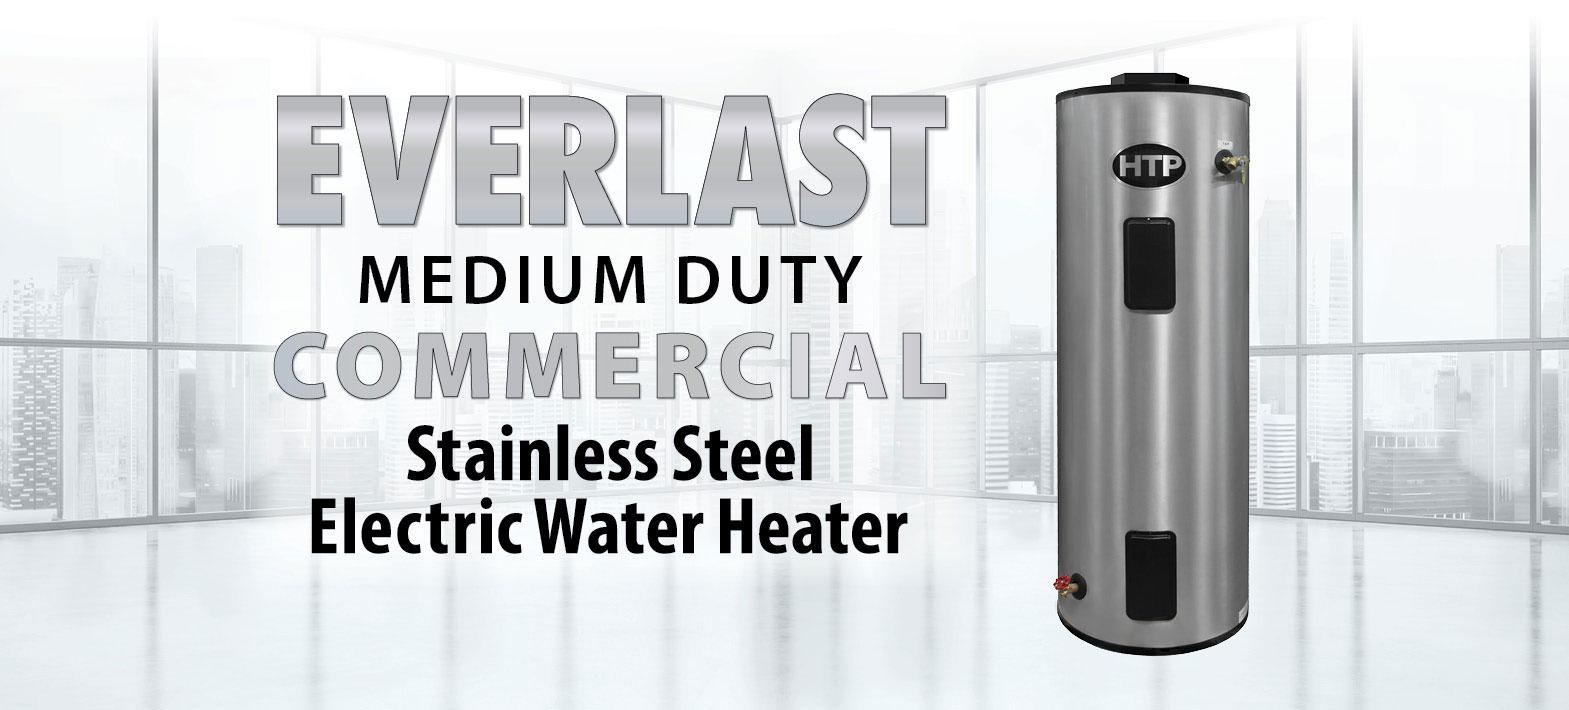 Htp Everlast Medium Duty Commercial Water Heater